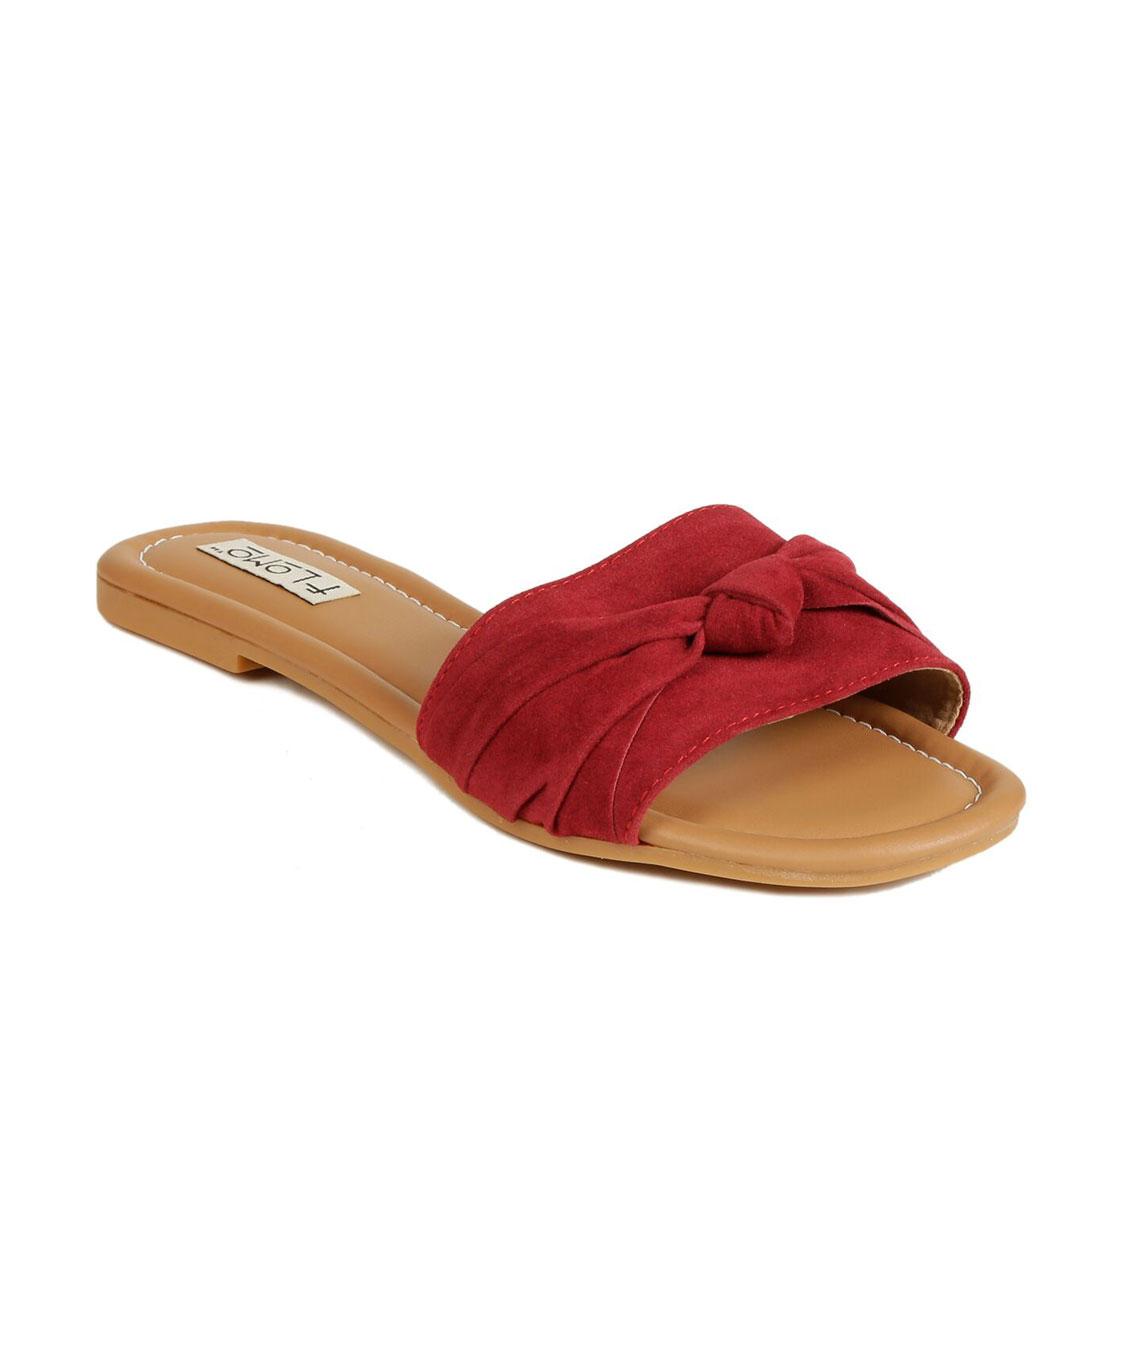 Flomo Women`s Red Resin Casual Flip Flop